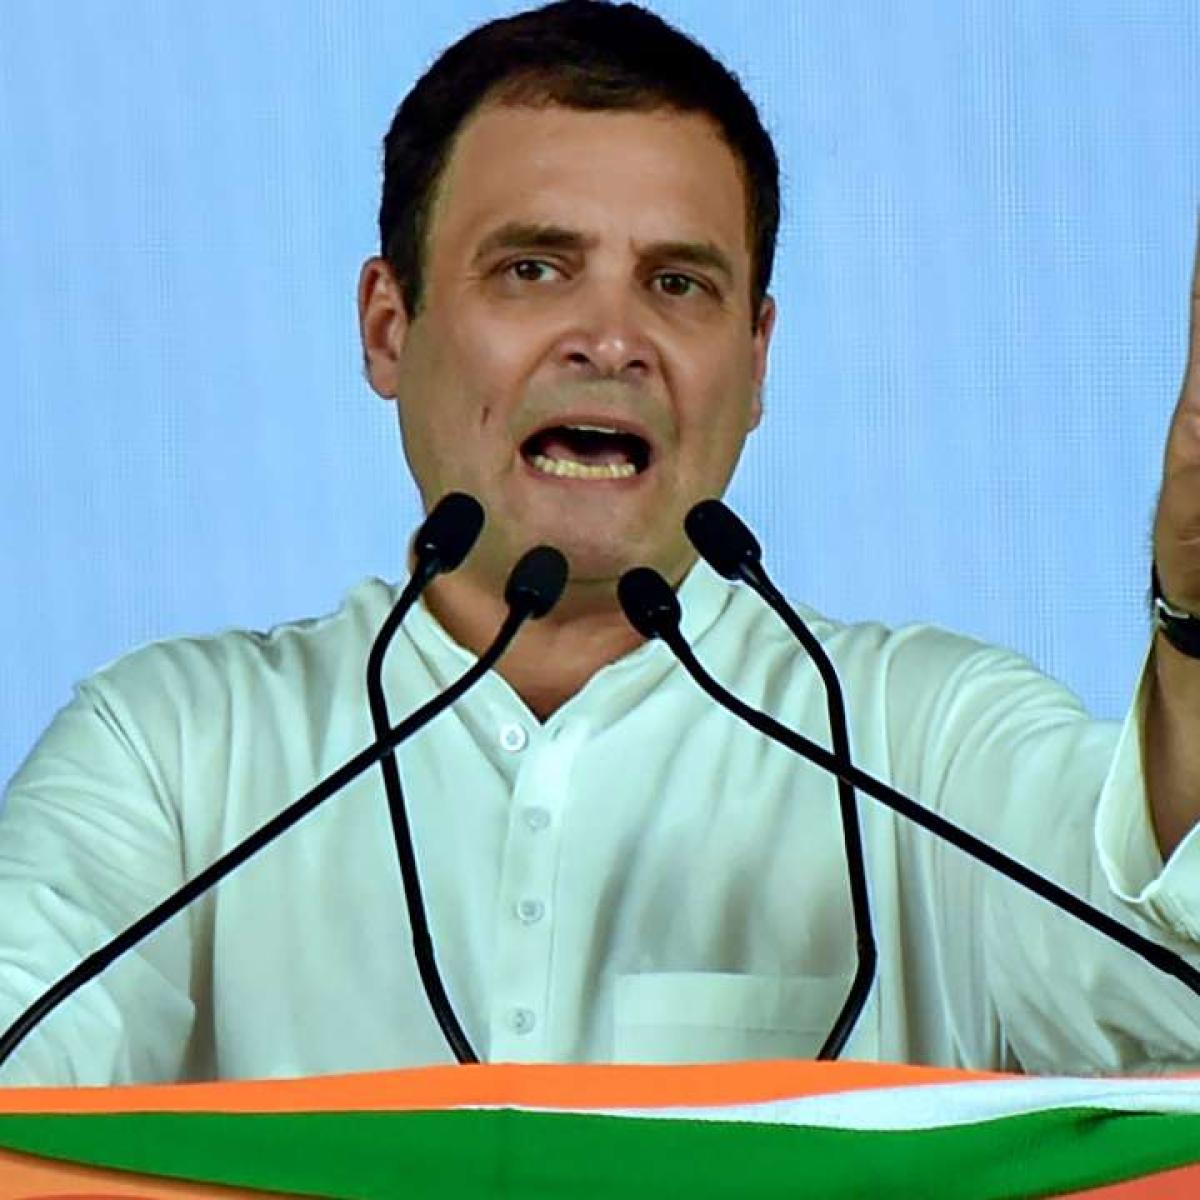 'Will go to Punjab if justice is blocked':  Rahul Gandhi on criticism over Hoshiarpur rape-murder case